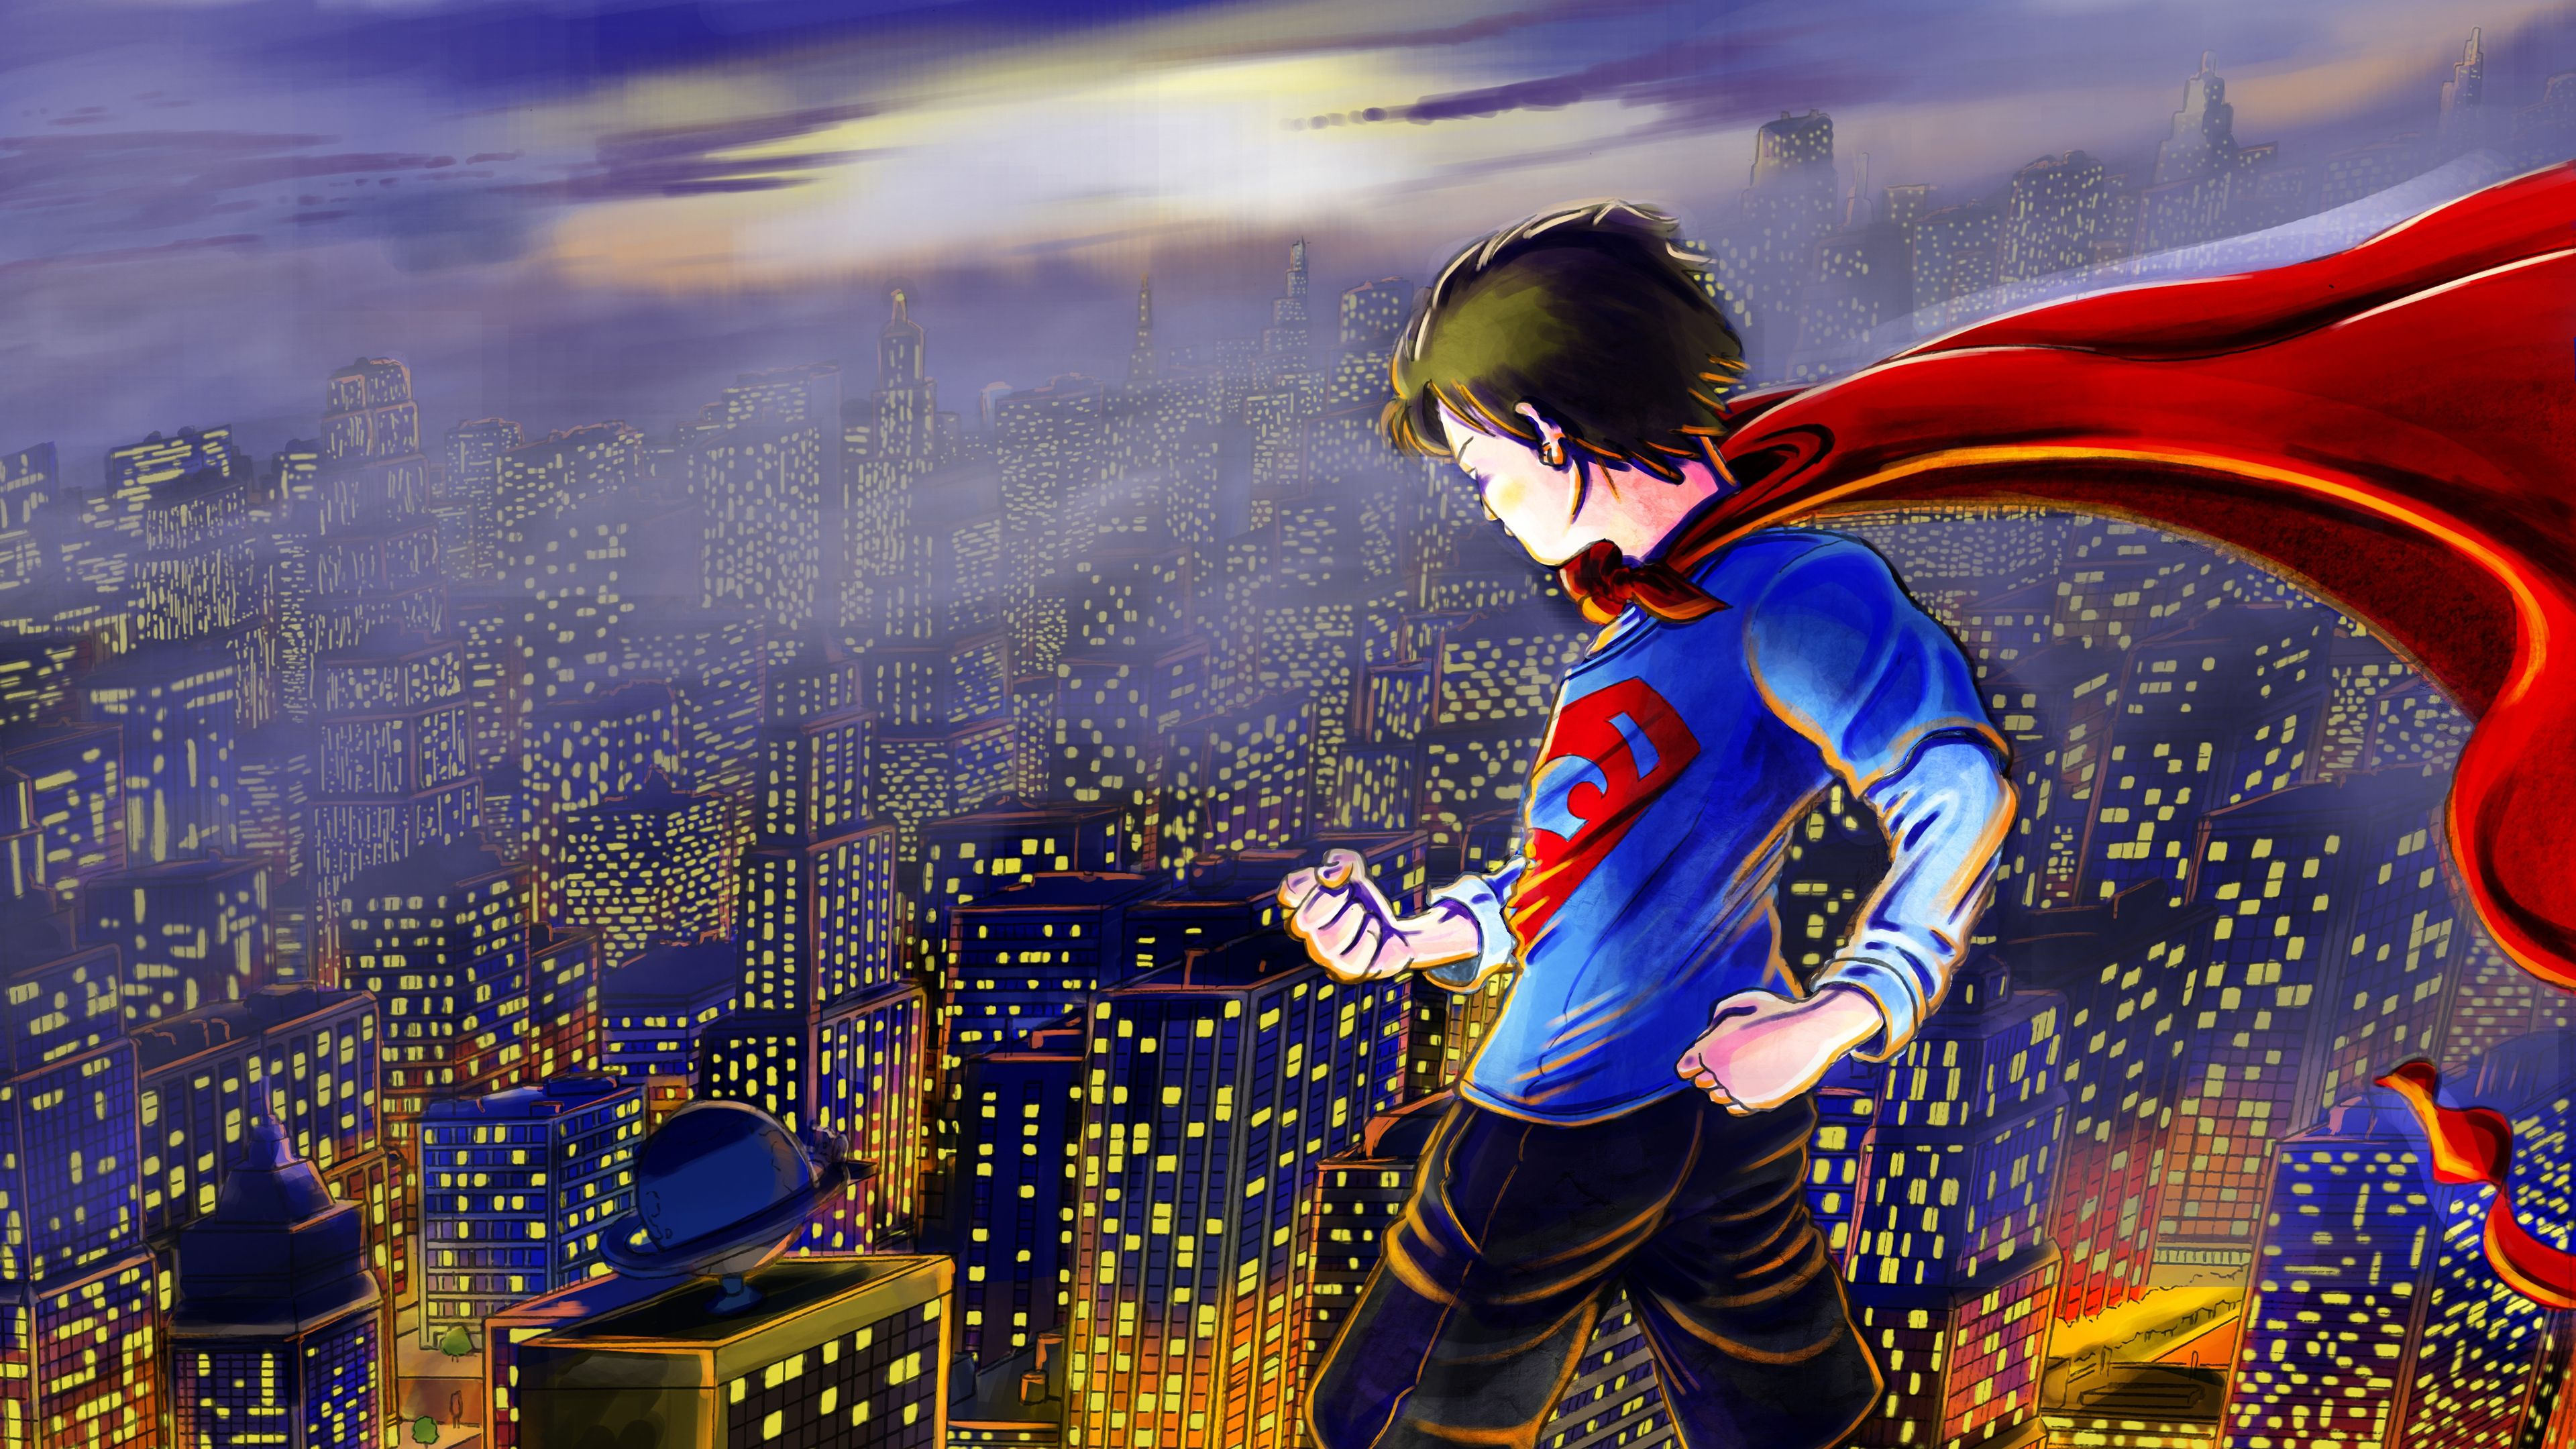 Wallpaper 4k Kid Superman art 4k 4kwallpapers, artwork